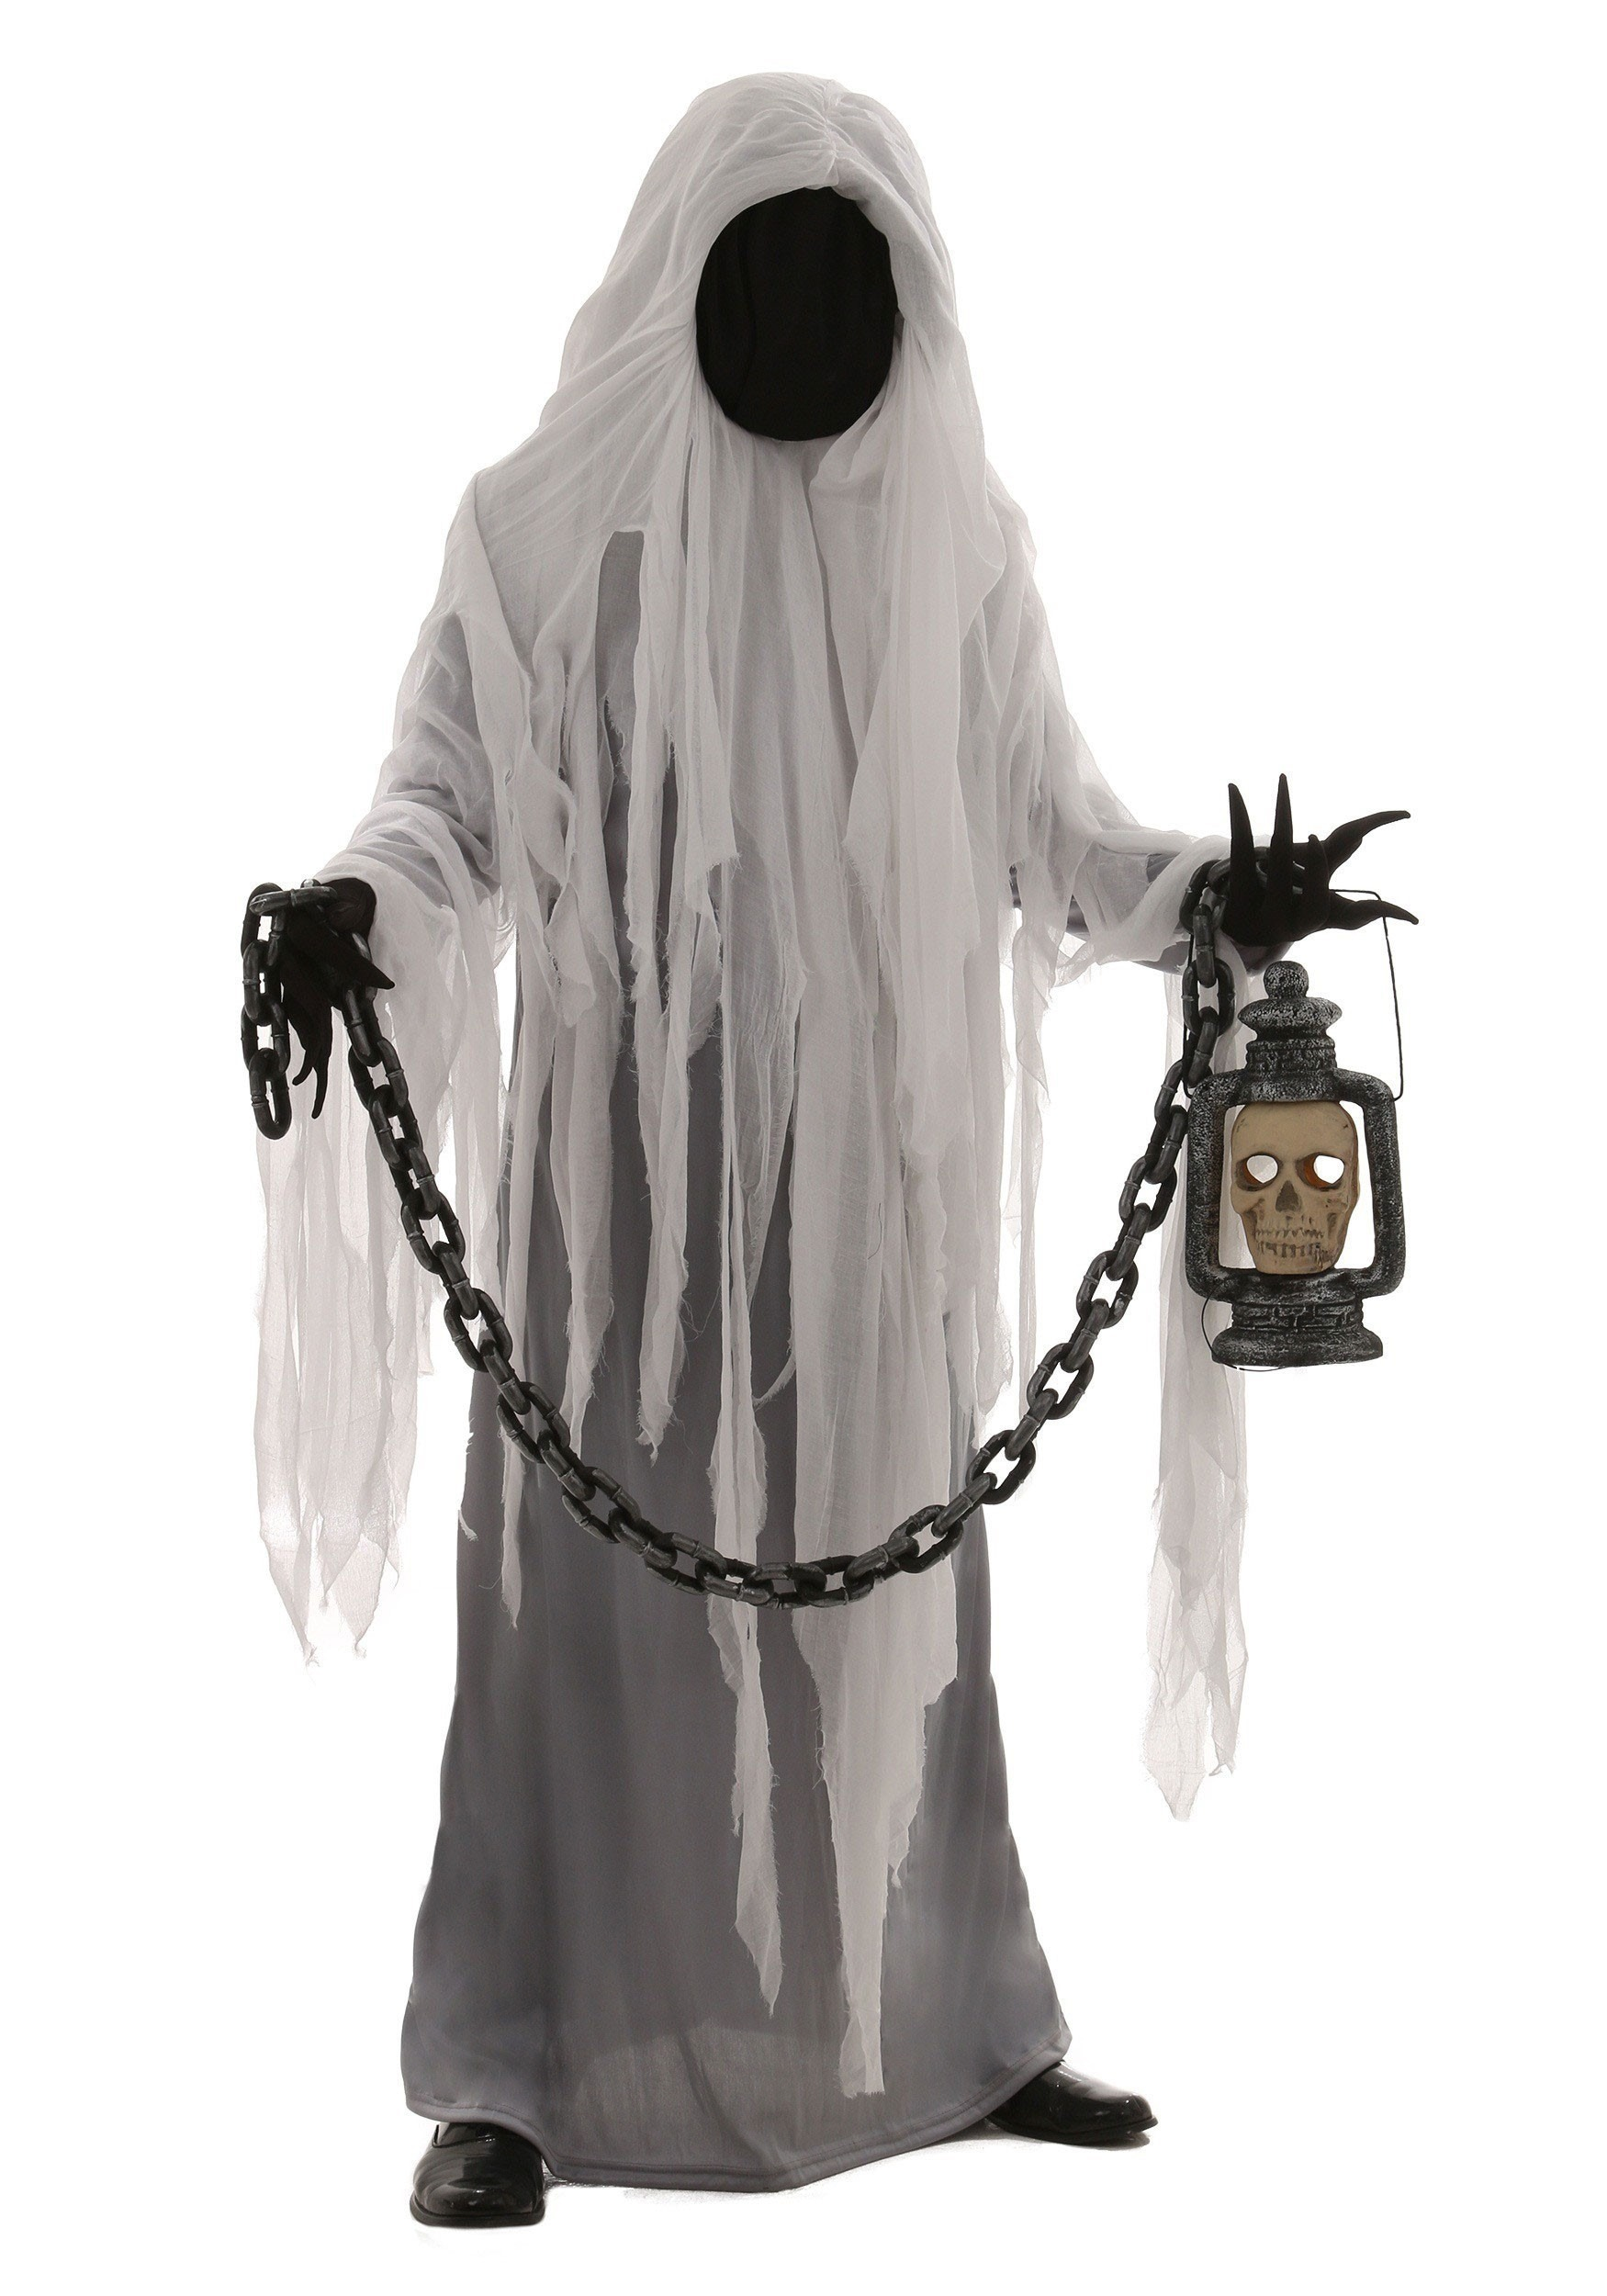 plus spooky ghost costume